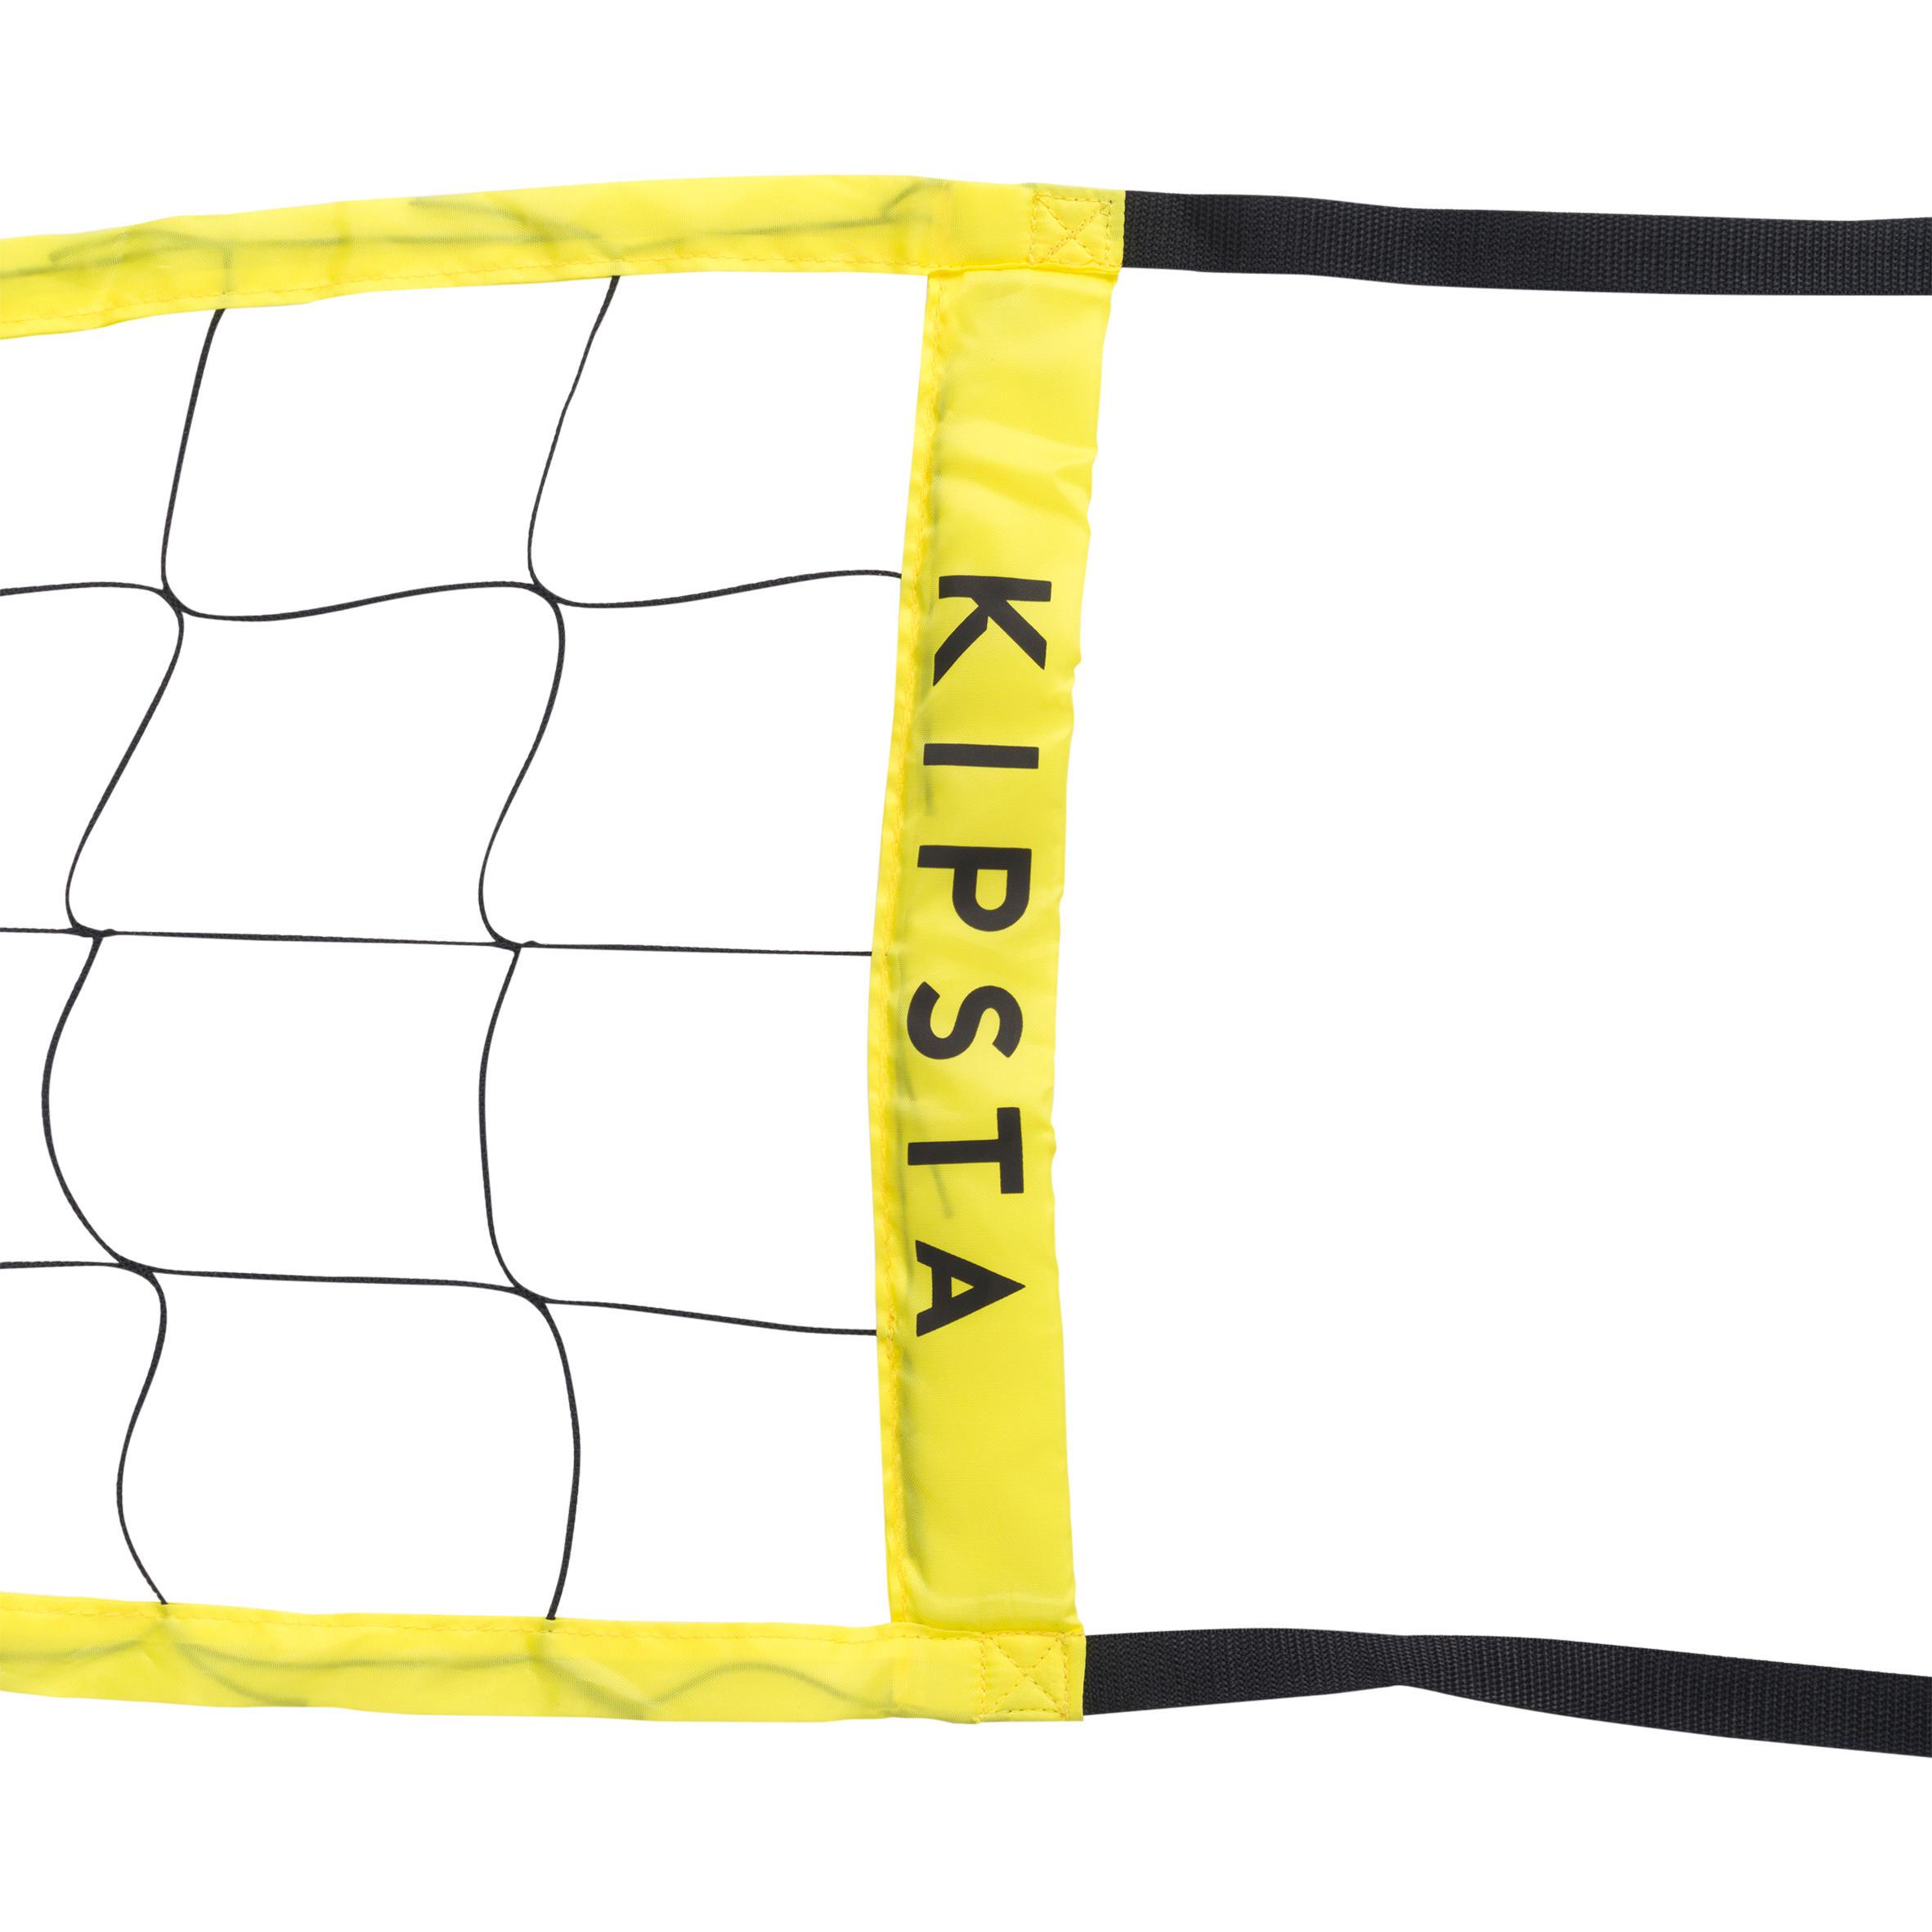 BV100 Wiz Net Volleyball and Beach Volleyball Net - Yellow